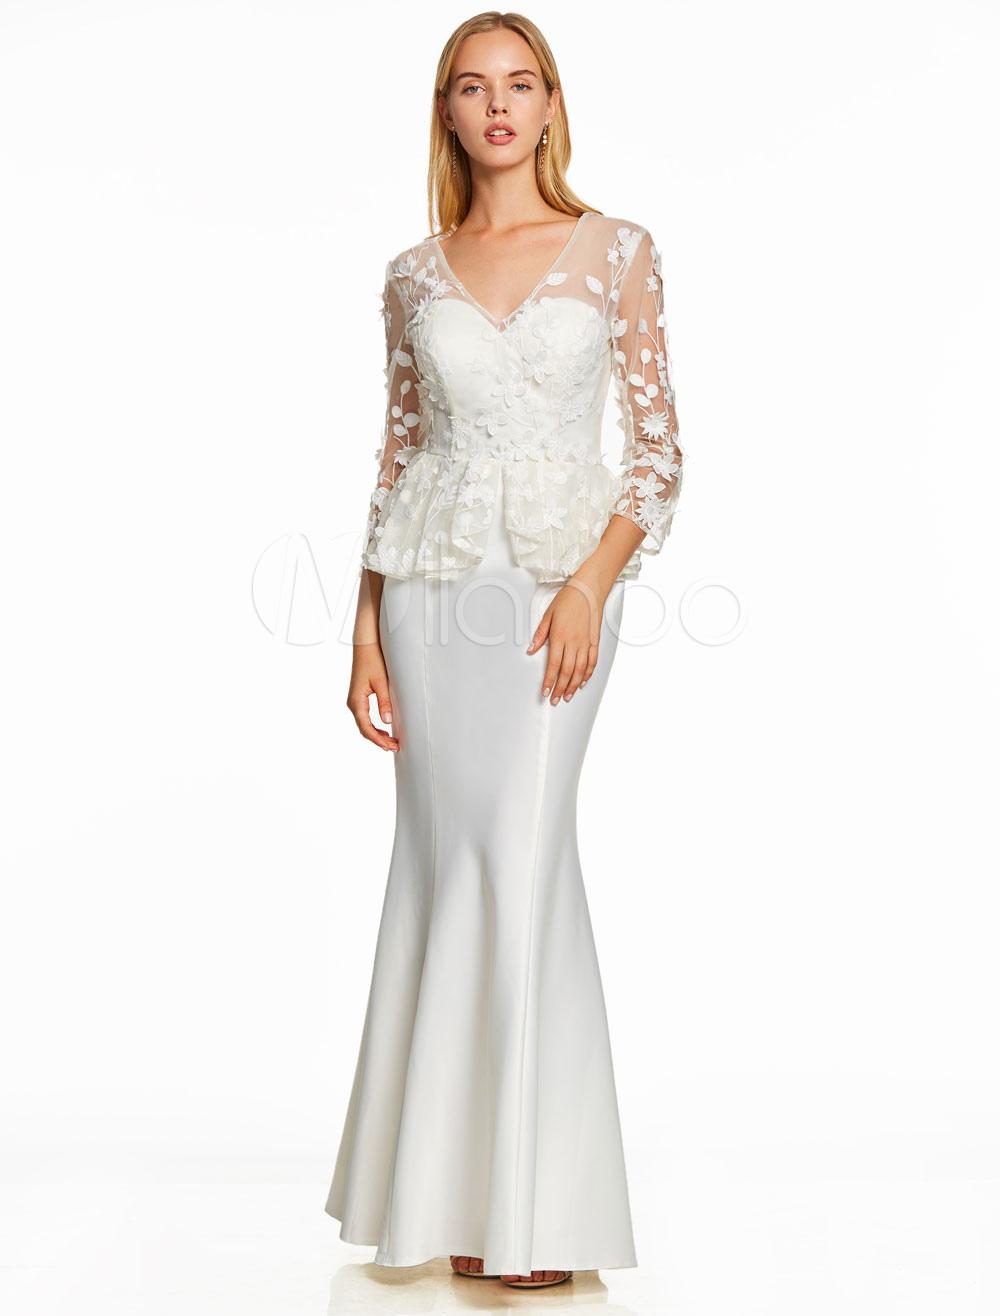 White Evening Dresses V Neck Peplum Flowers Applique Mermaid Long Sleeve Wedding Guest Dress (Cheap Party Dress) photo